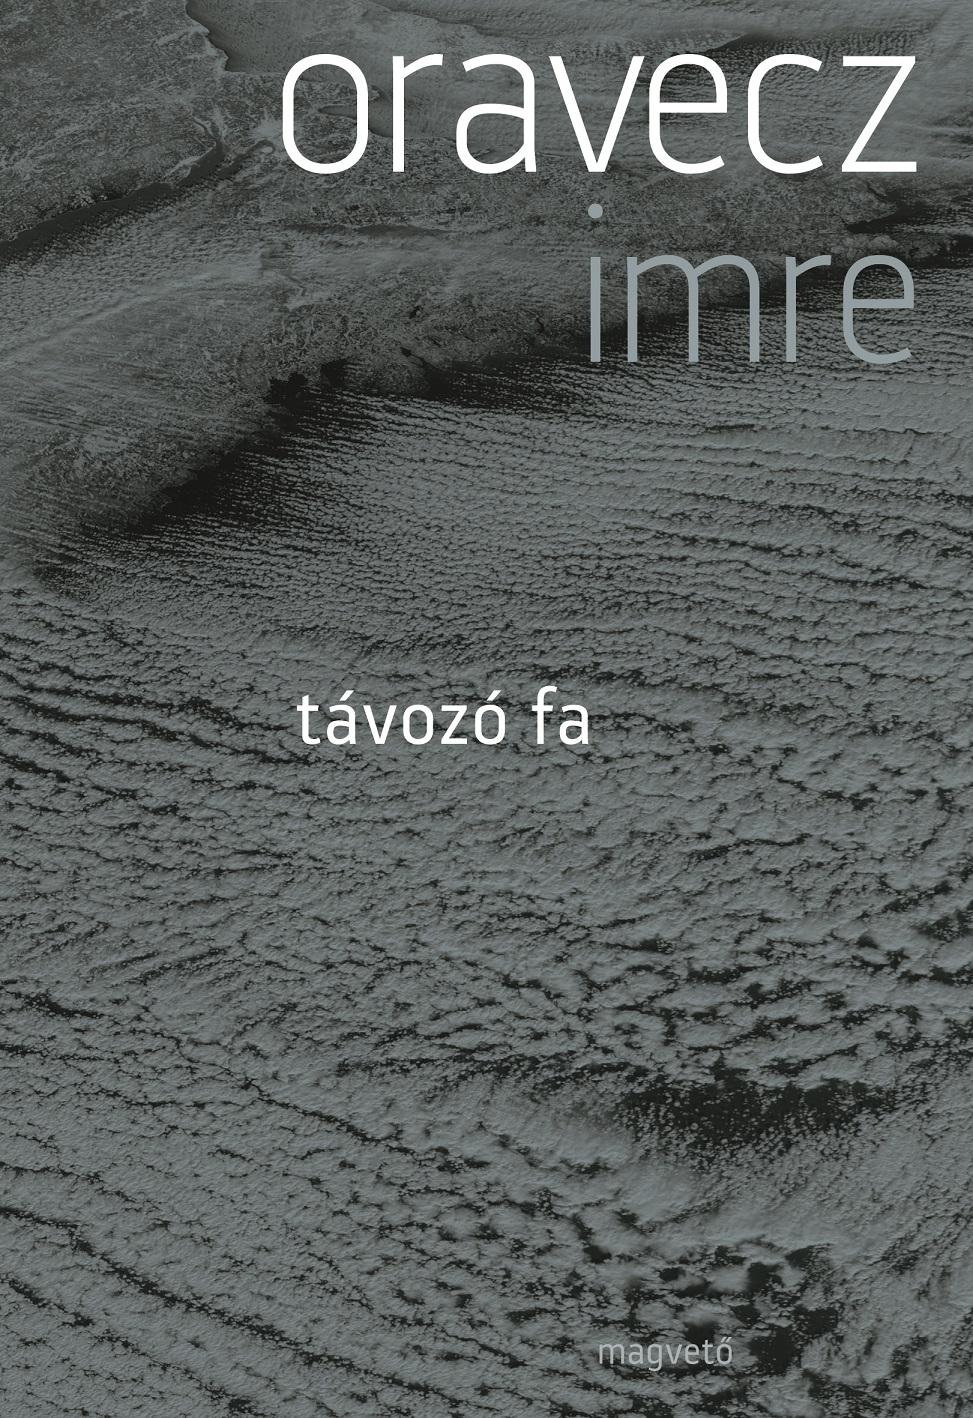 tavozo